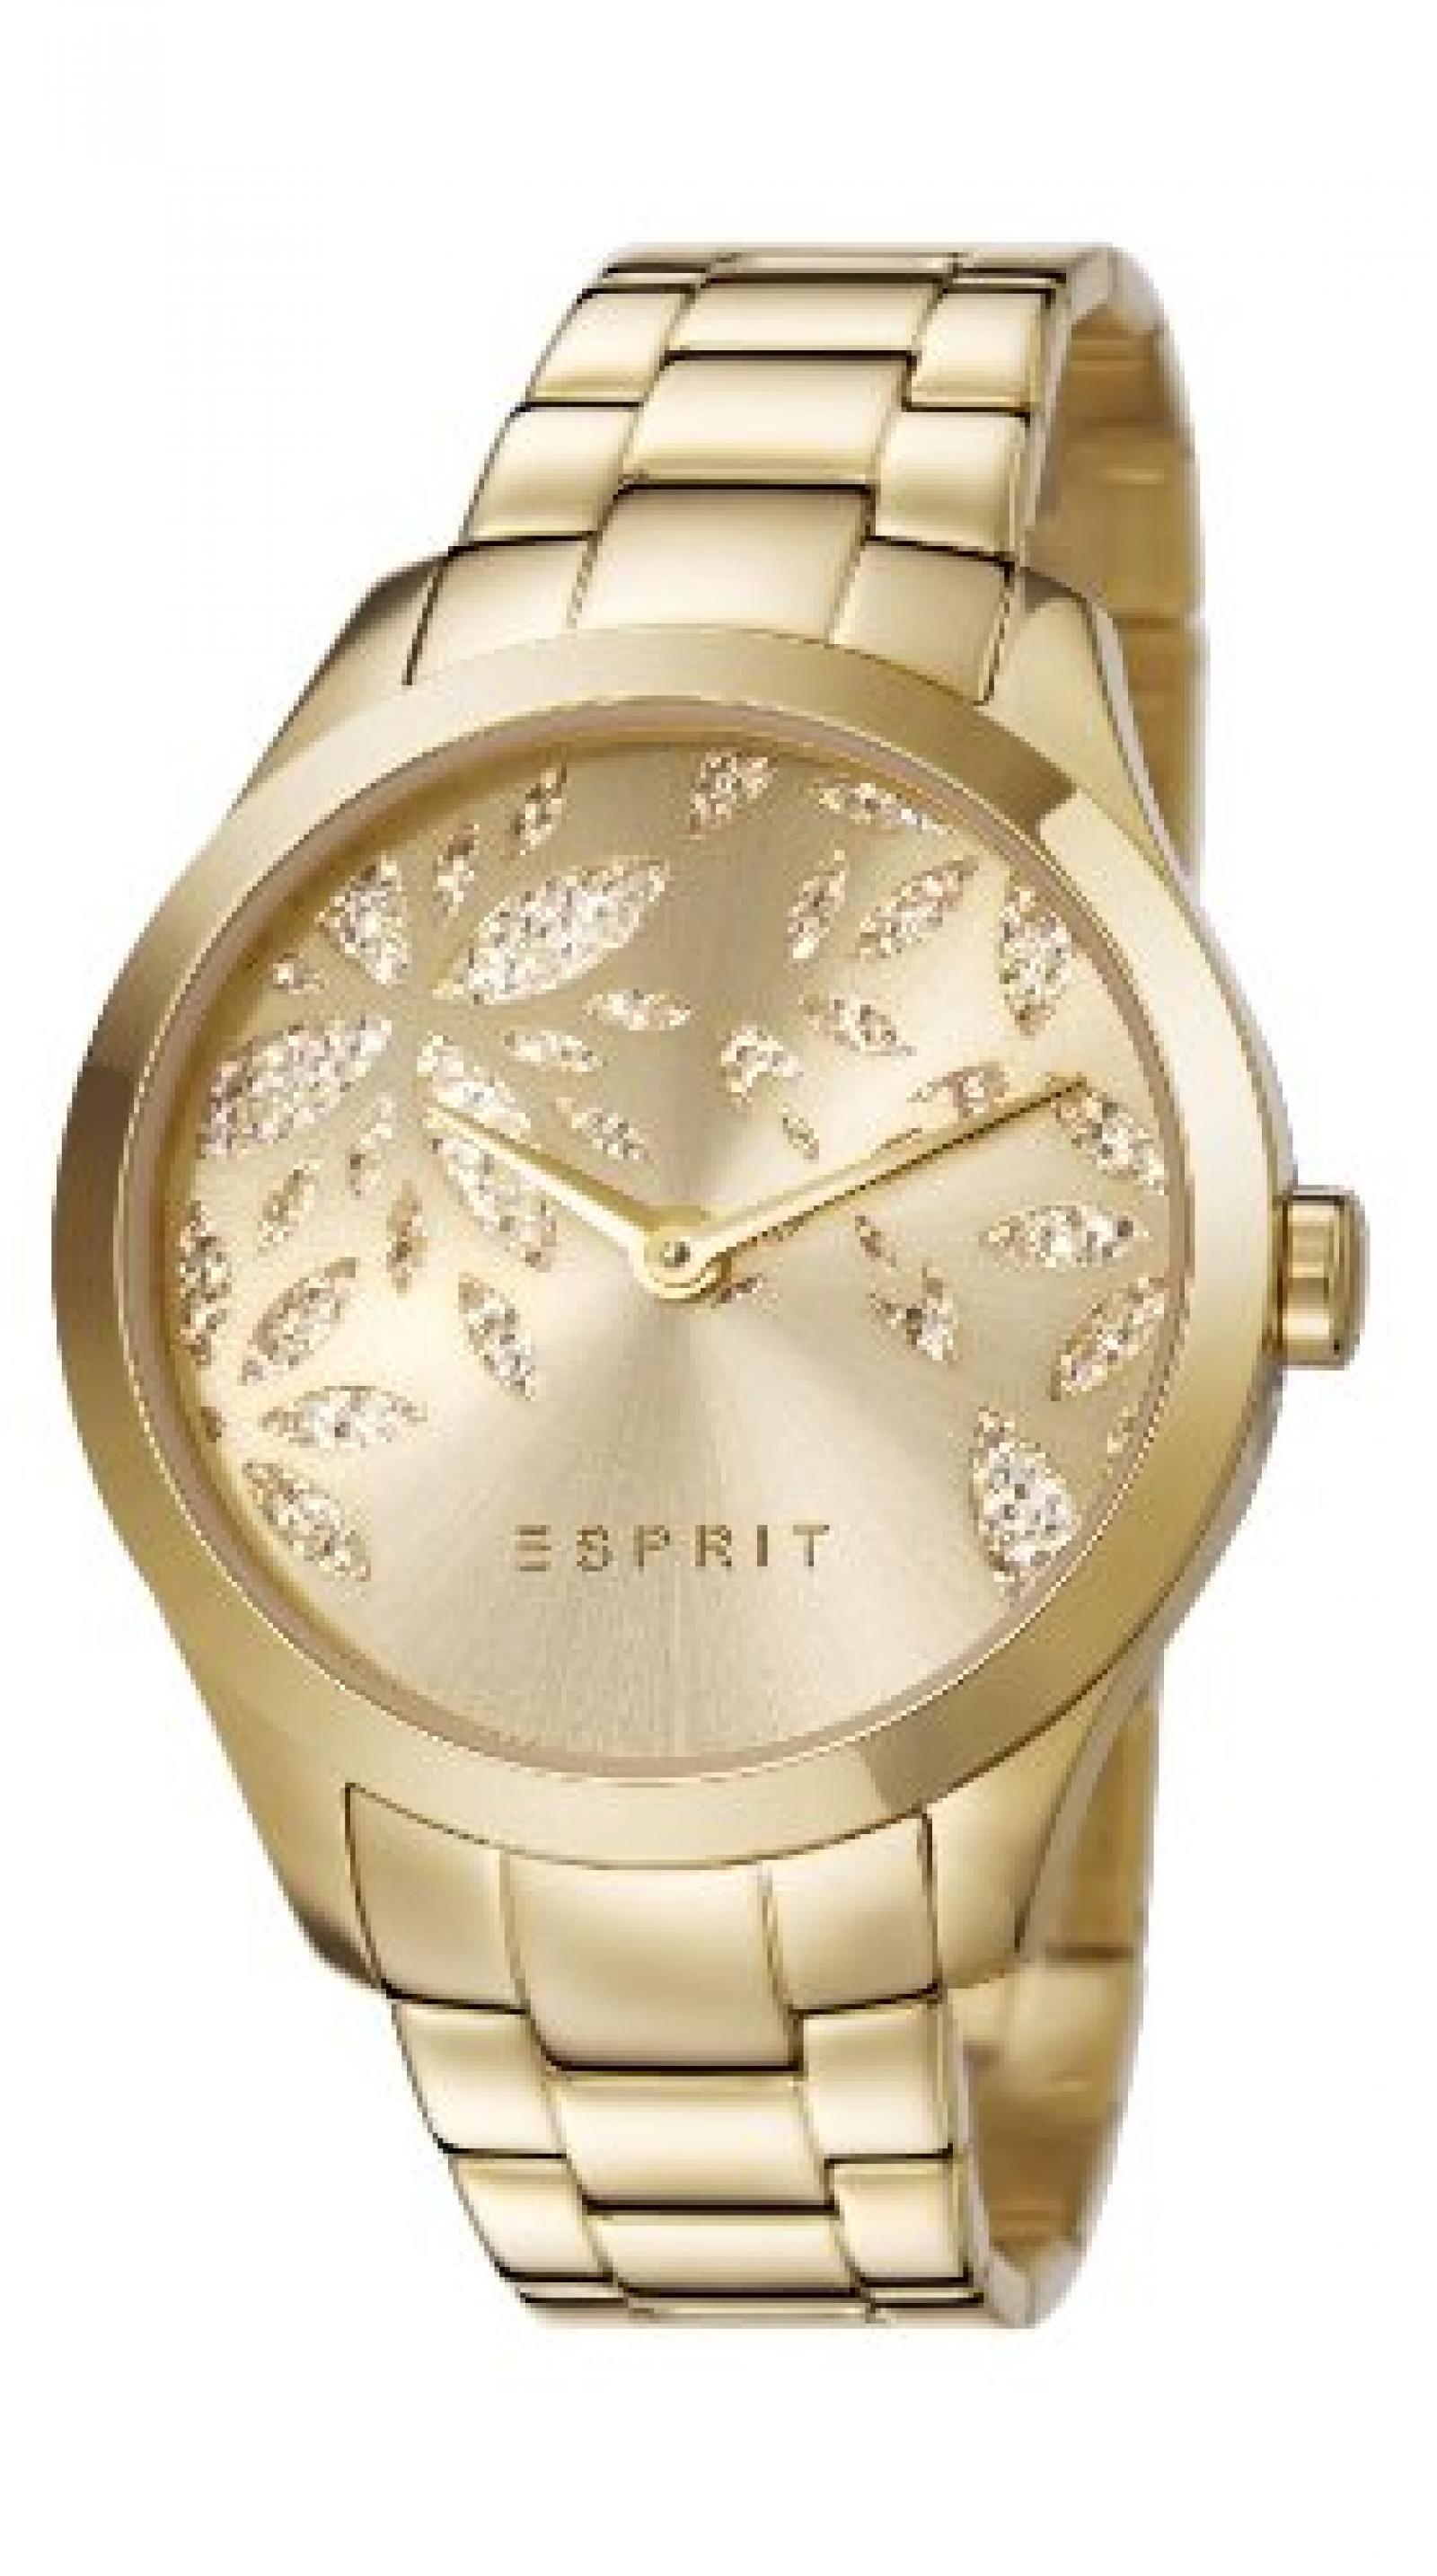 Esprit Damen-Armbanduhr Analog Quarz Edelstahl beschichtet ES107282003